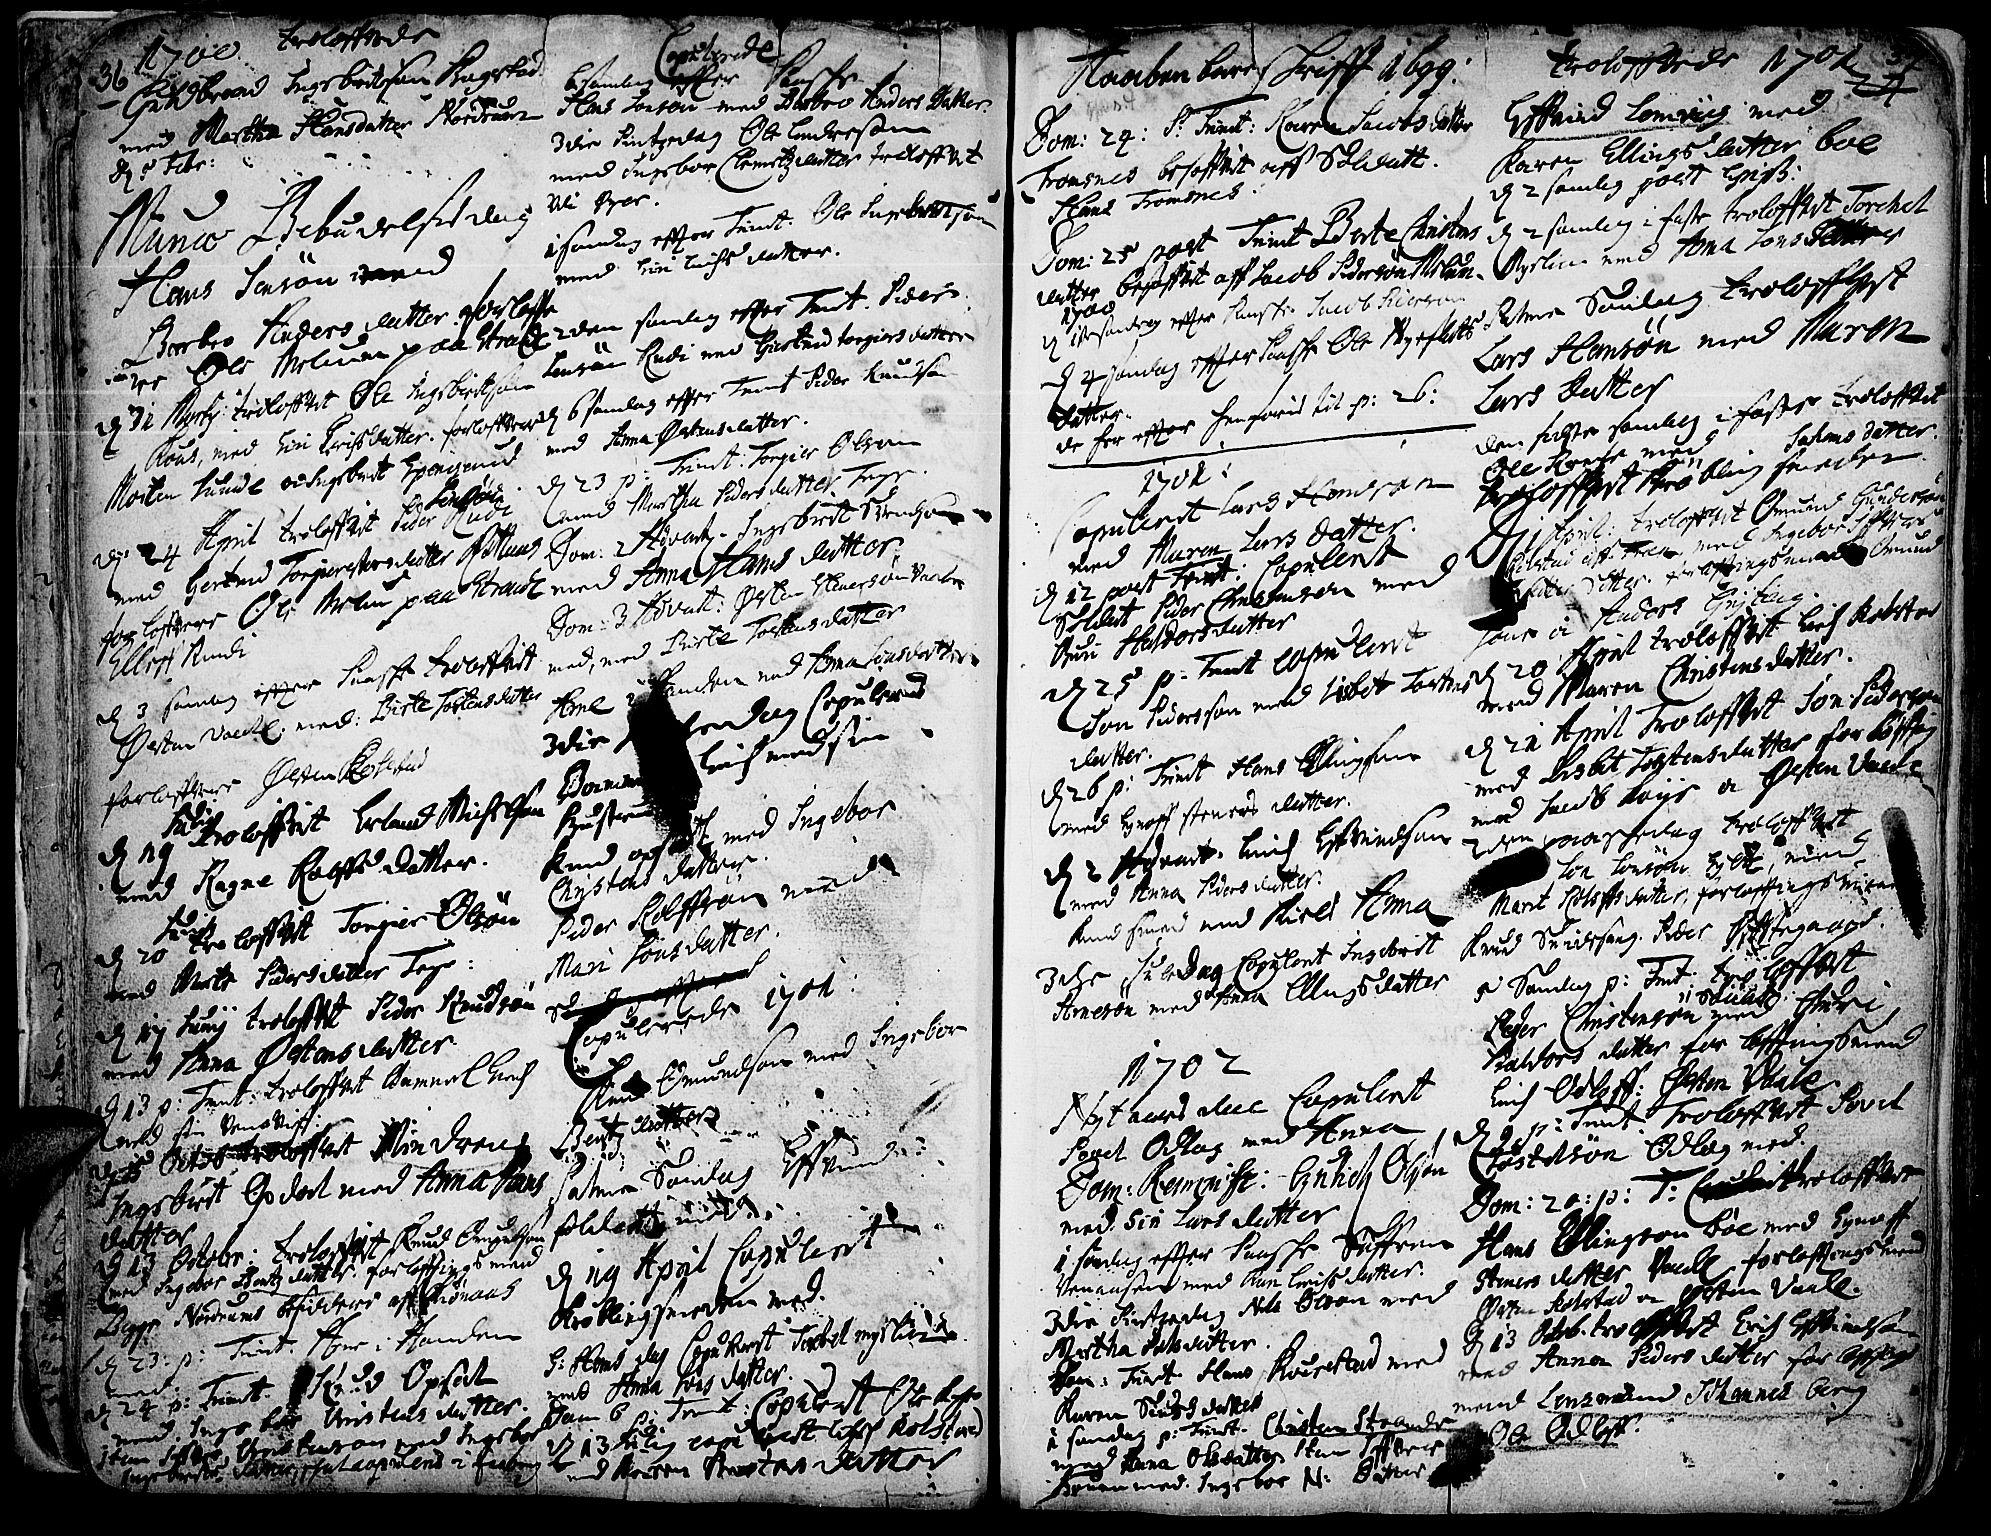 SAH, Ringebu prestekontor, Ministerialbok nr. 1, 1696-1733, s. 36-37